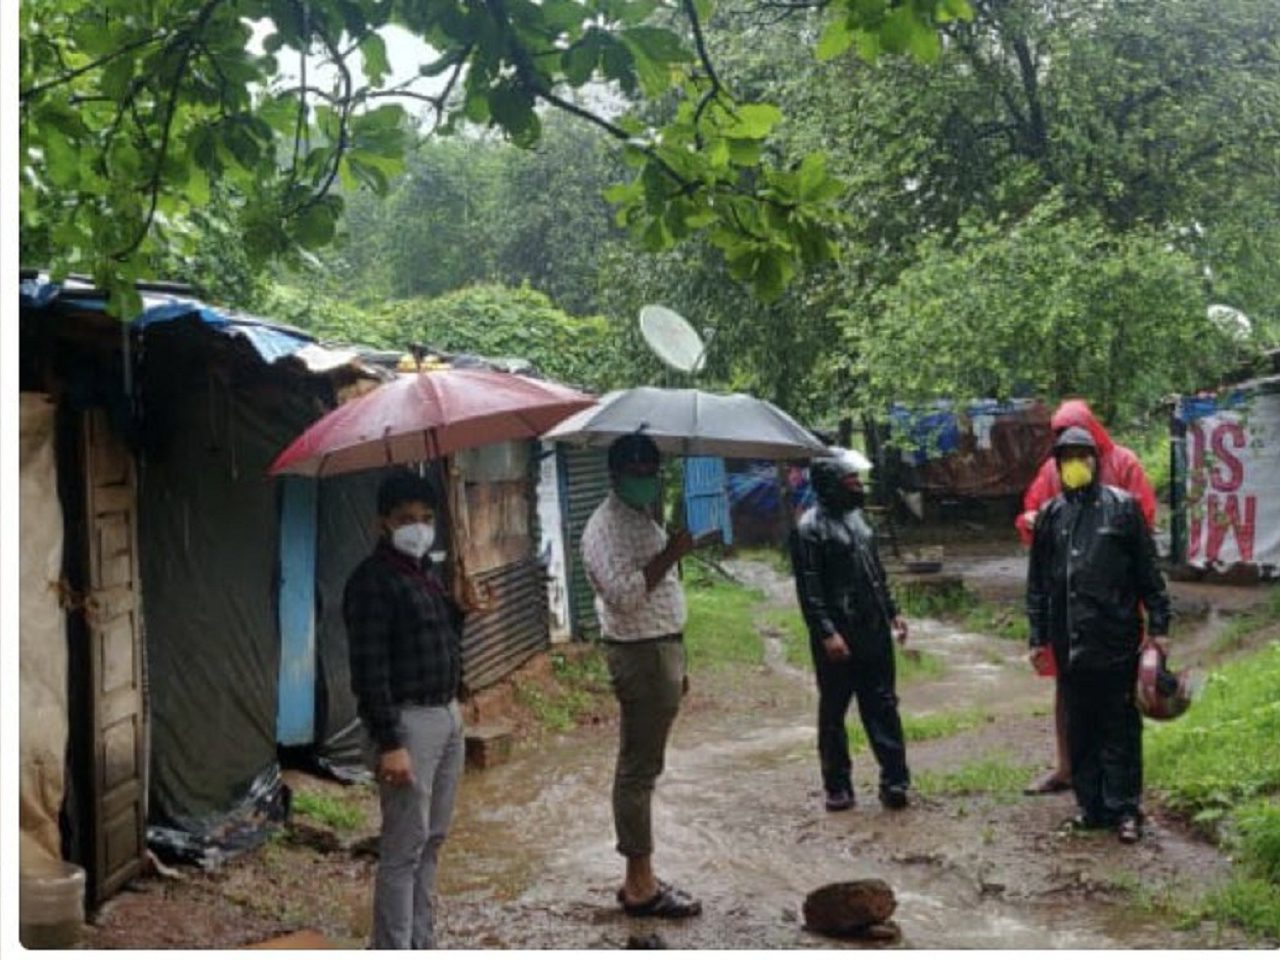 Deputy Collector, Bardez Shri.Akshay Potekar Along With Joint Mamlatdar Shri. Sandeep Gawade Inspected The Area Of Gumalwaddo, Anjuna.